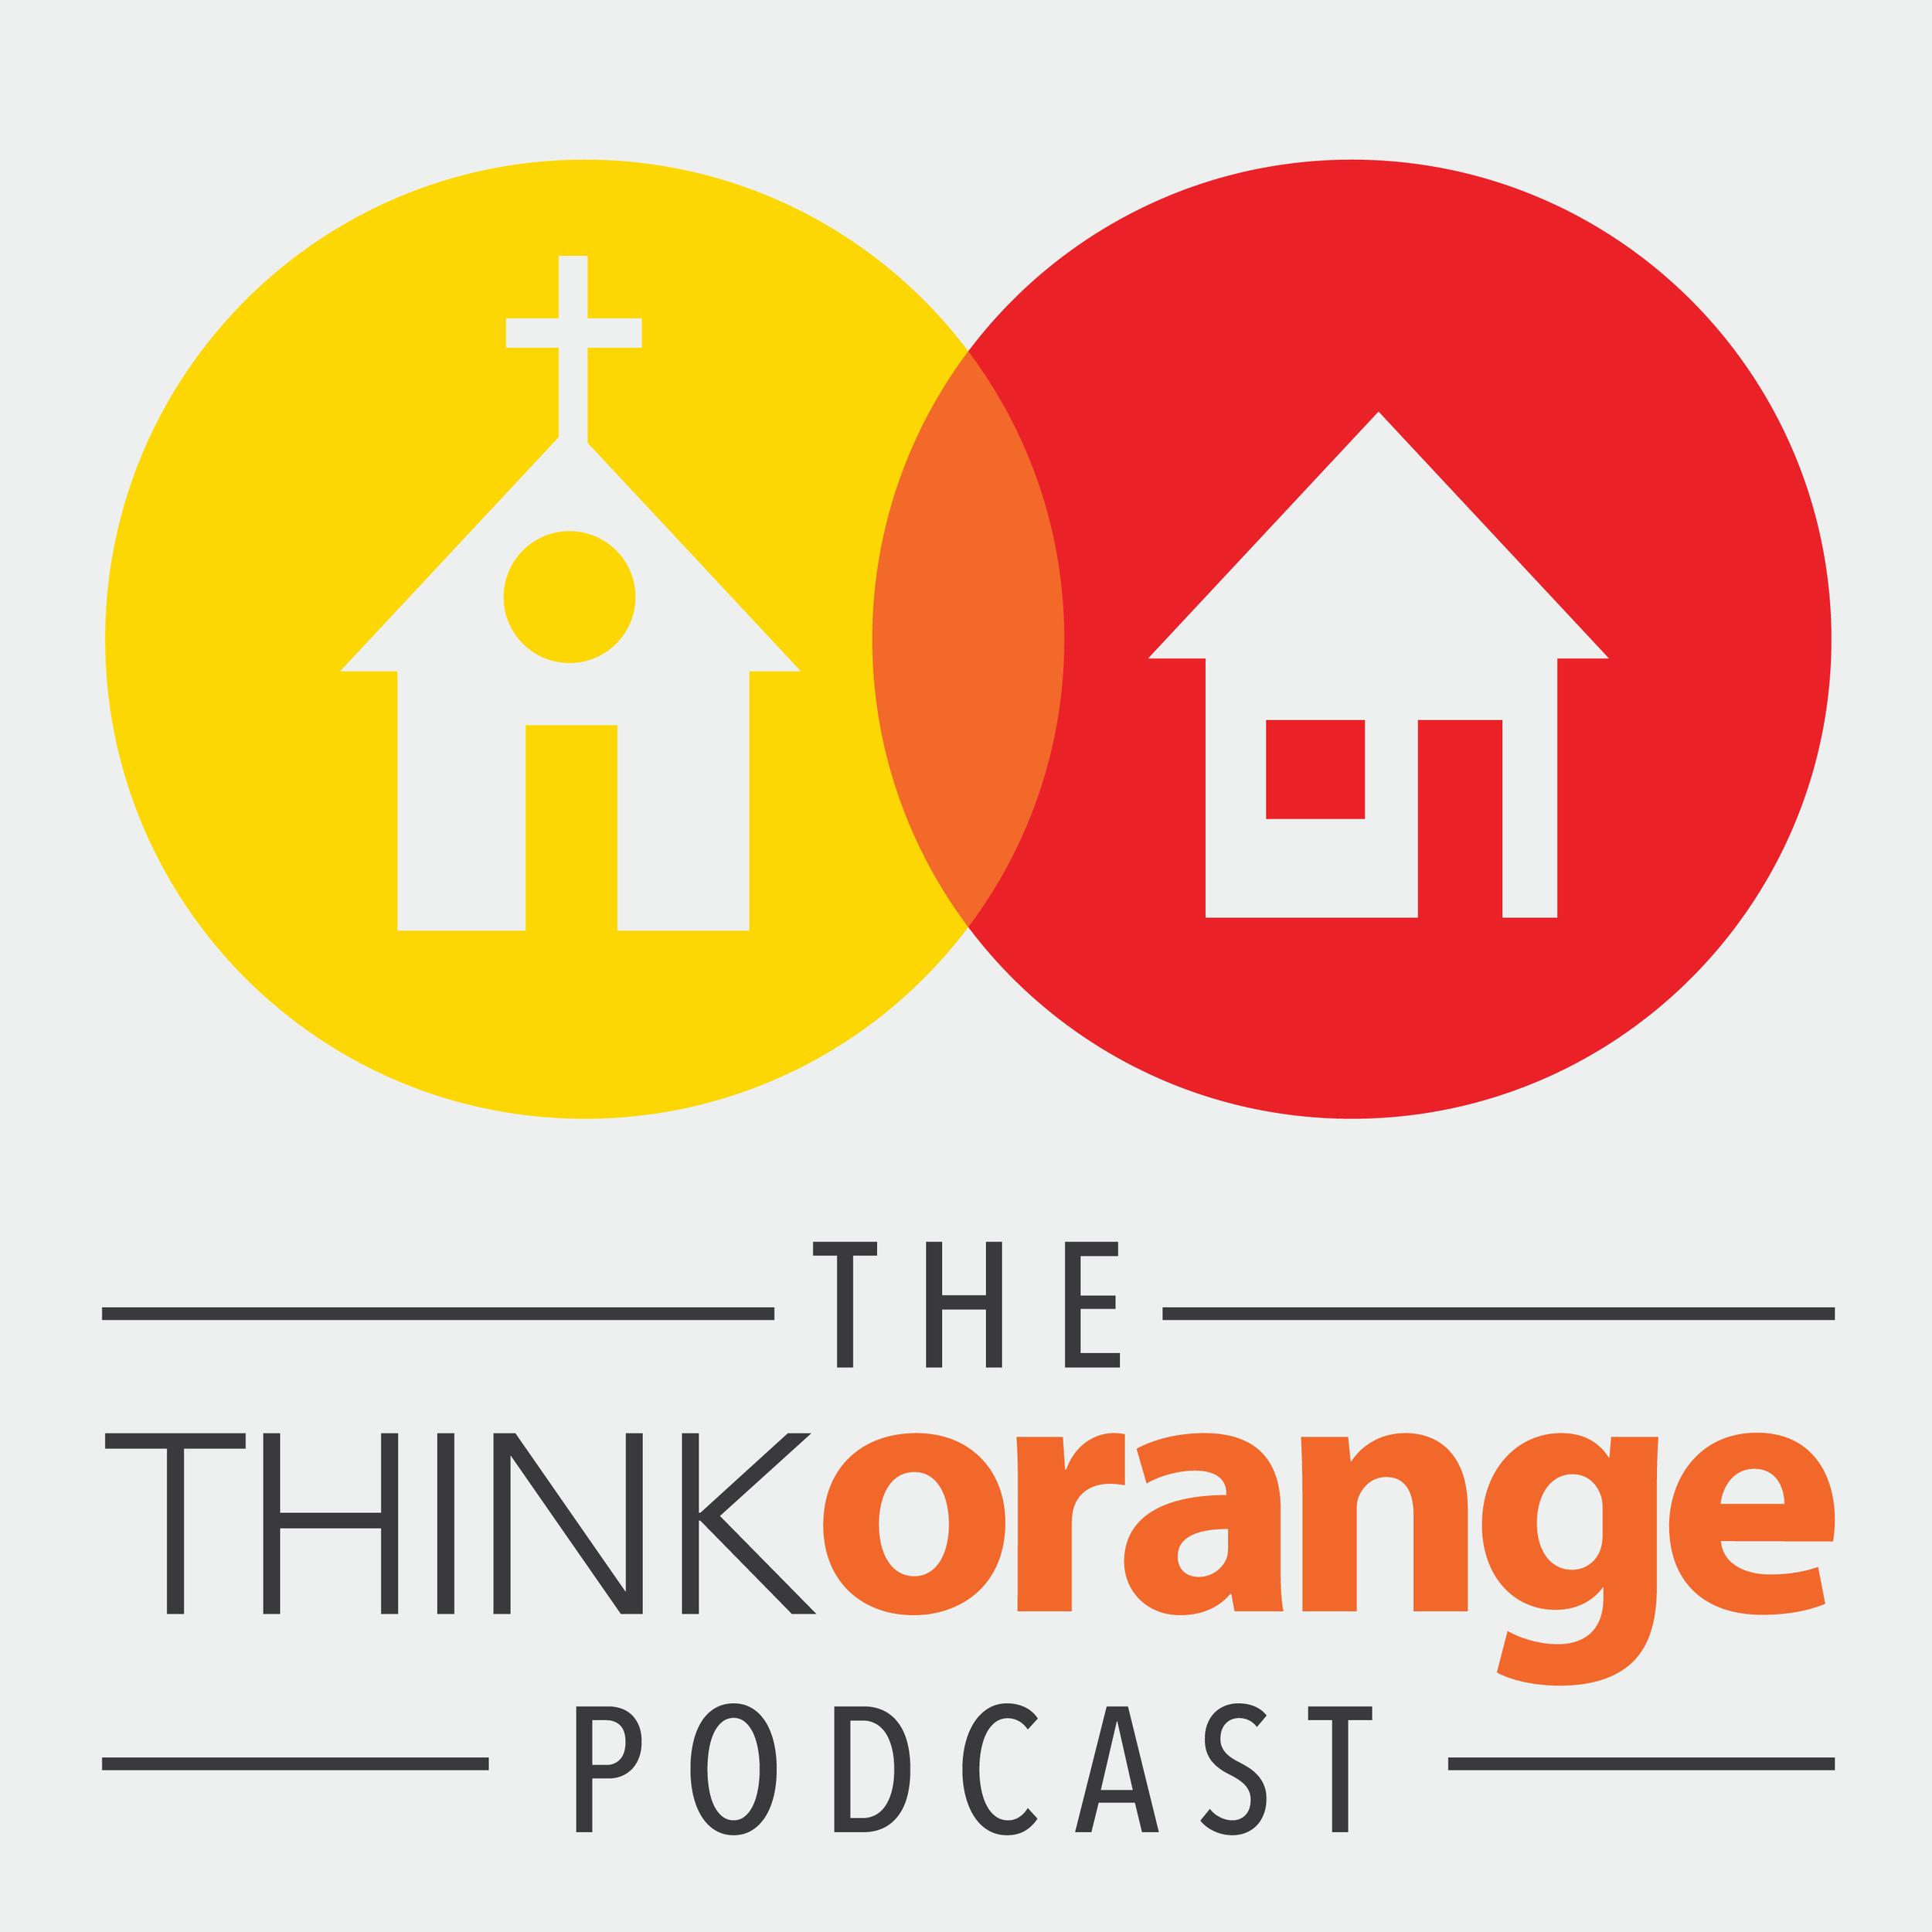 ThinkOrangePodcastLogo_FINAL.png